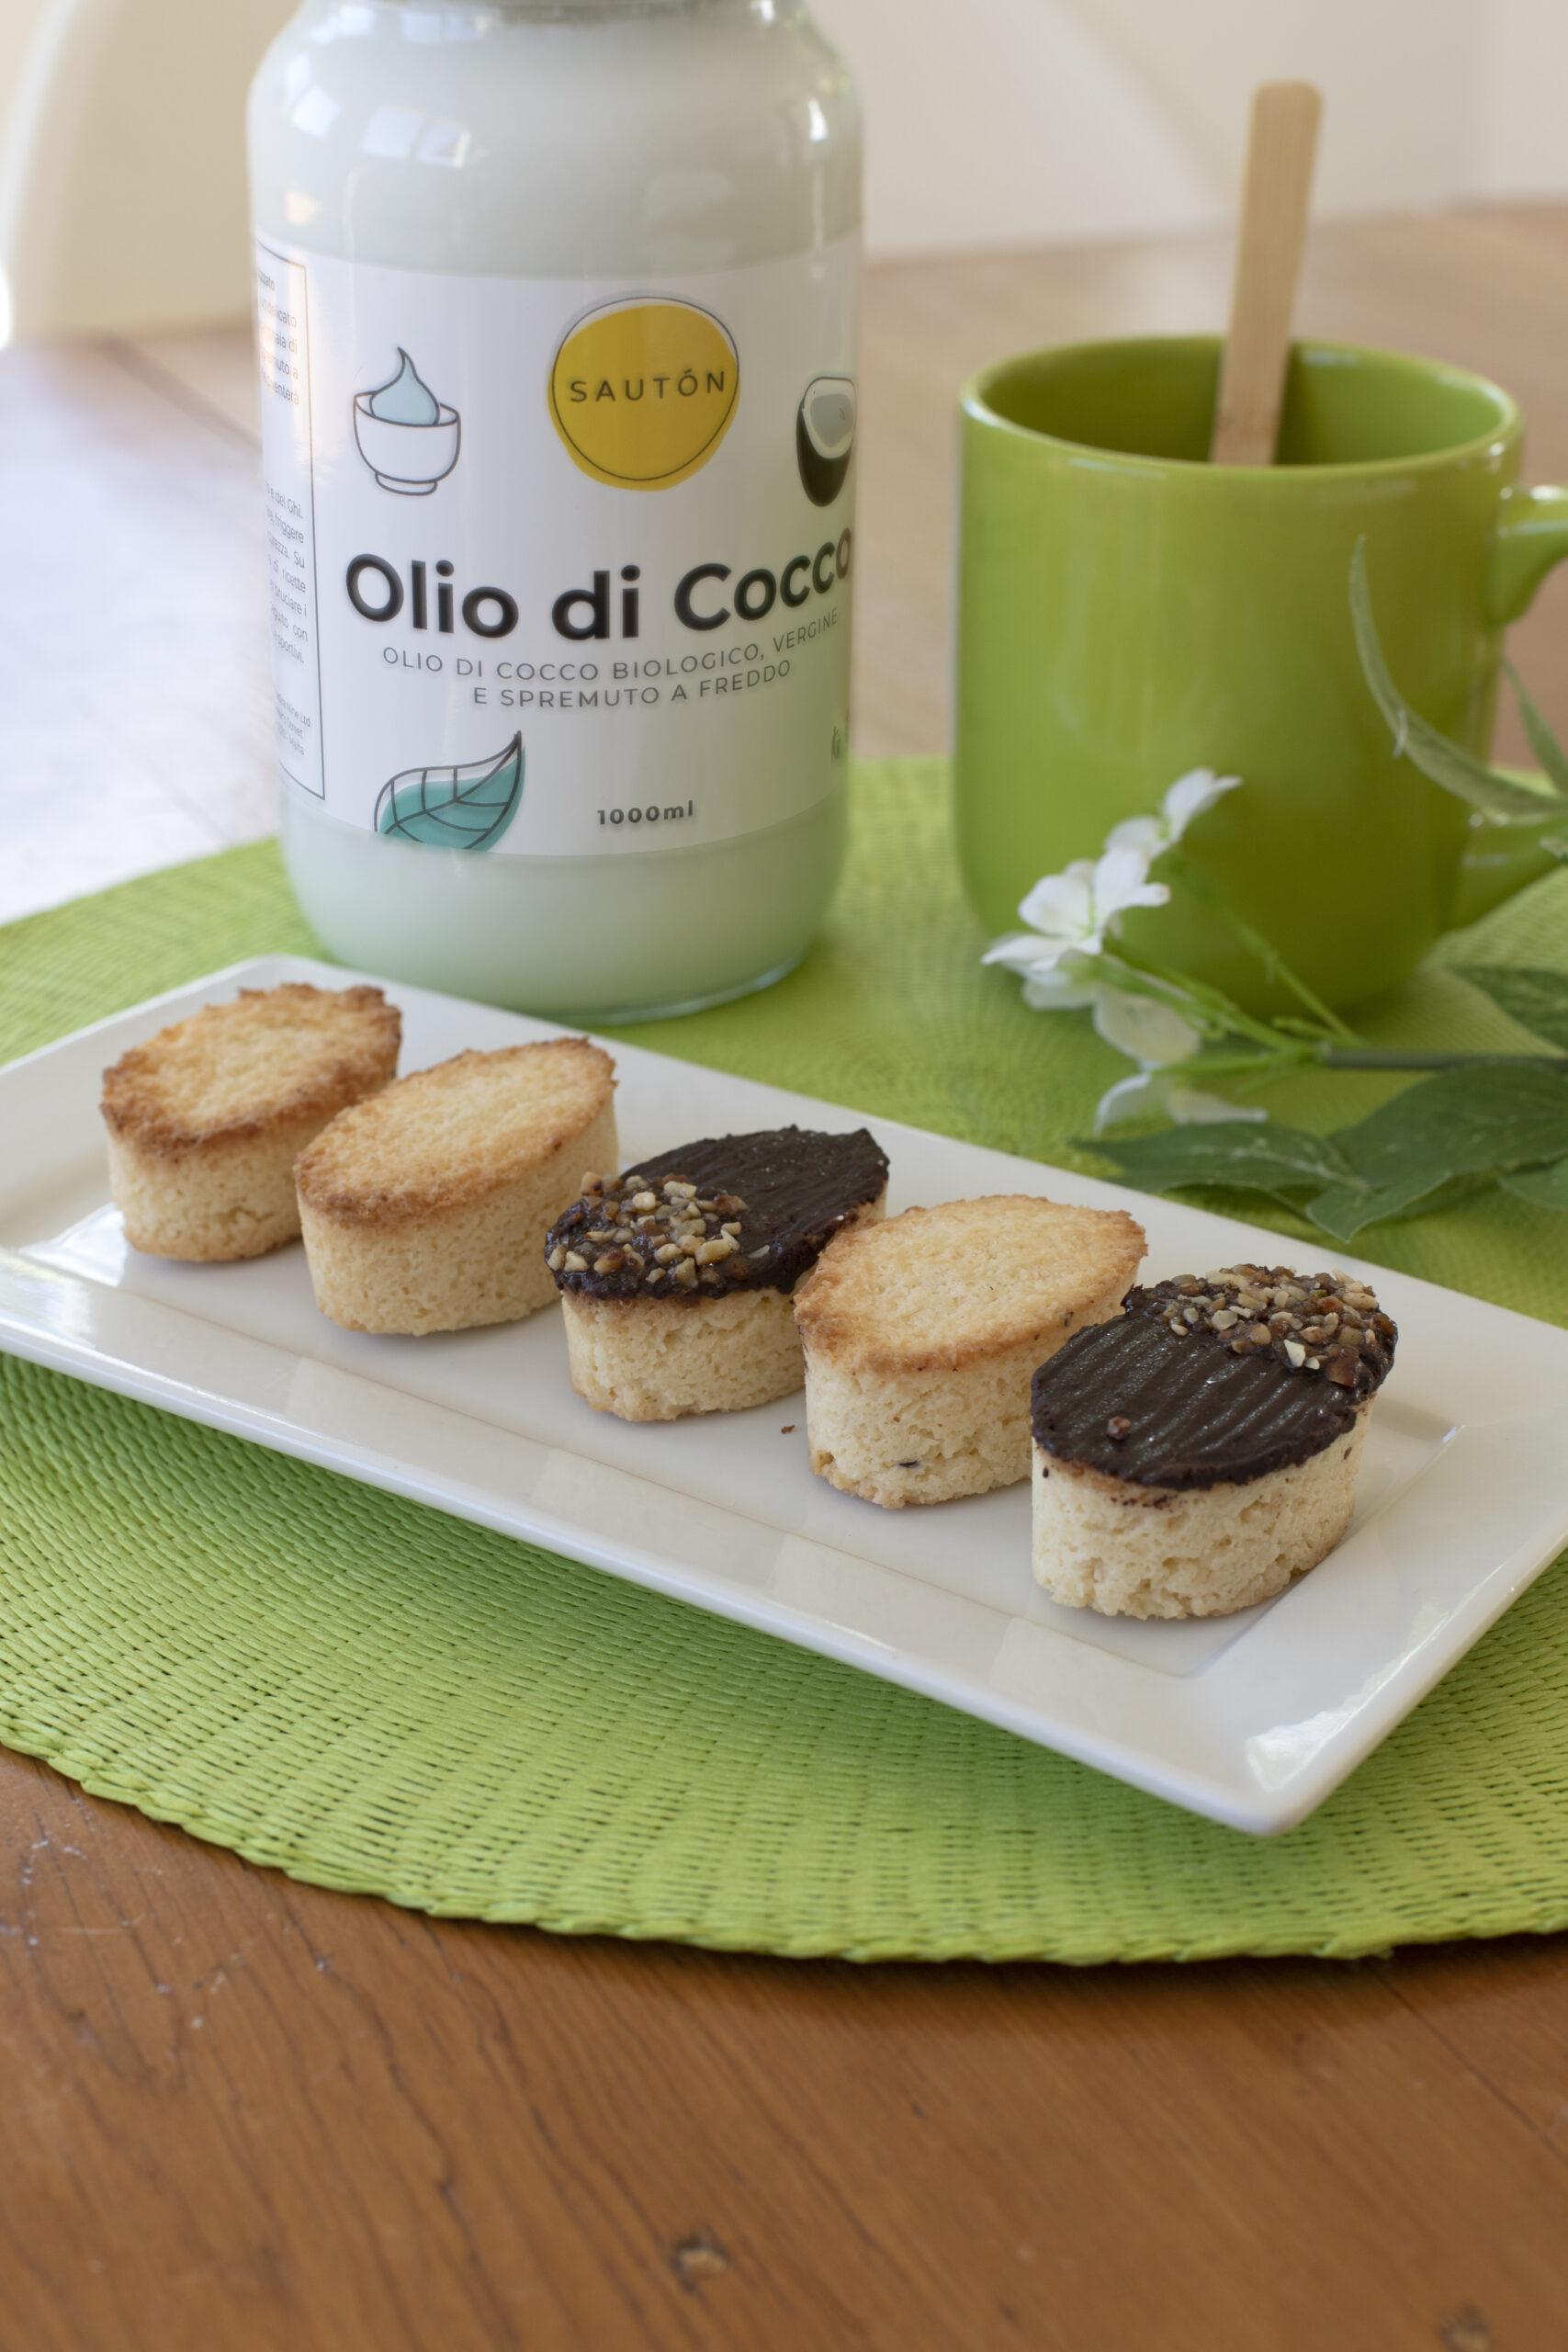 Biscotti ovali al cocco 2